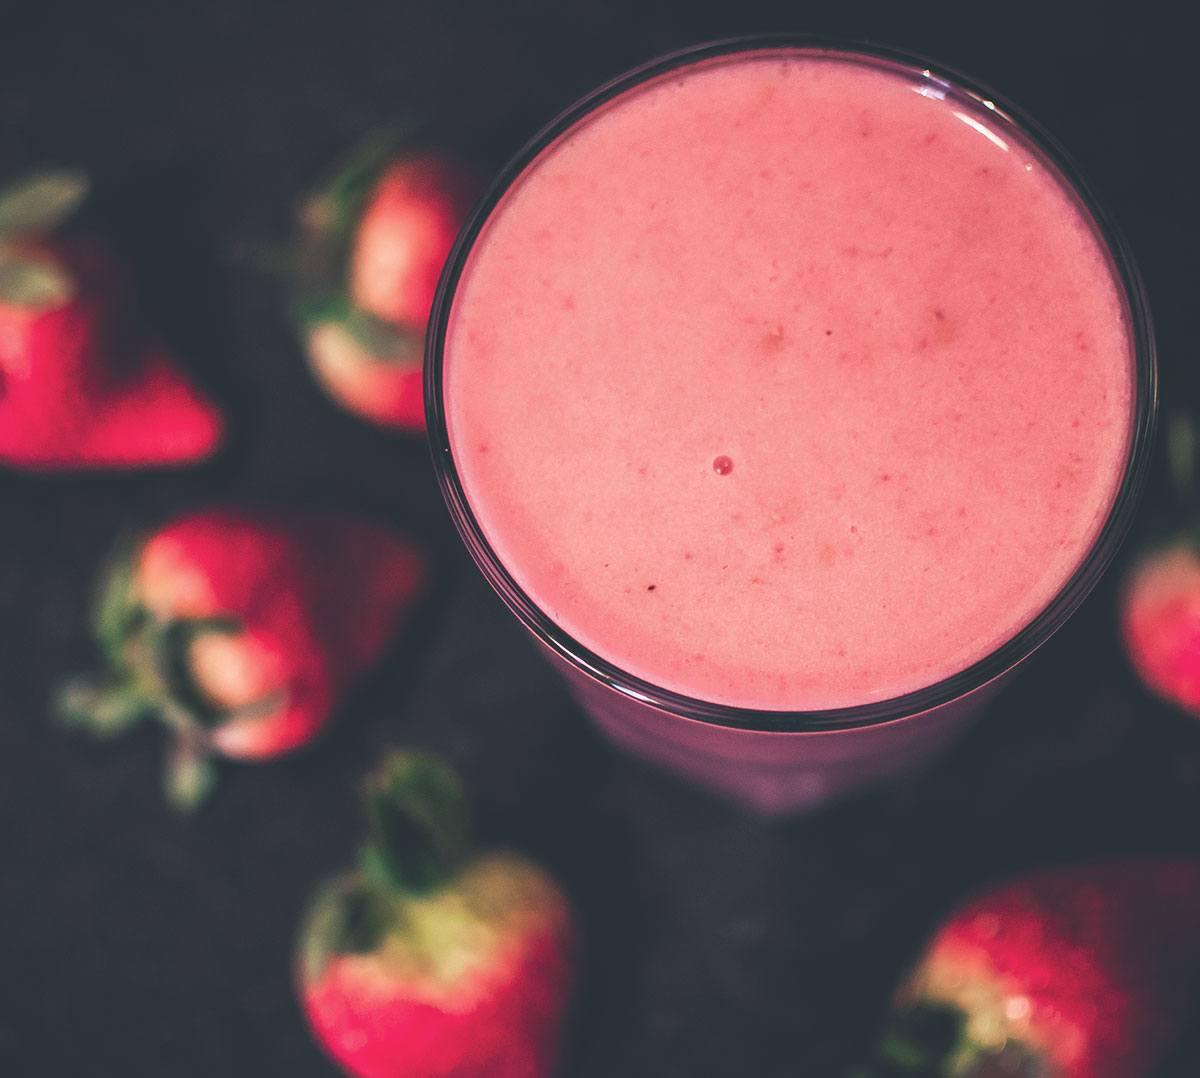 Bebida de maracujá e morango